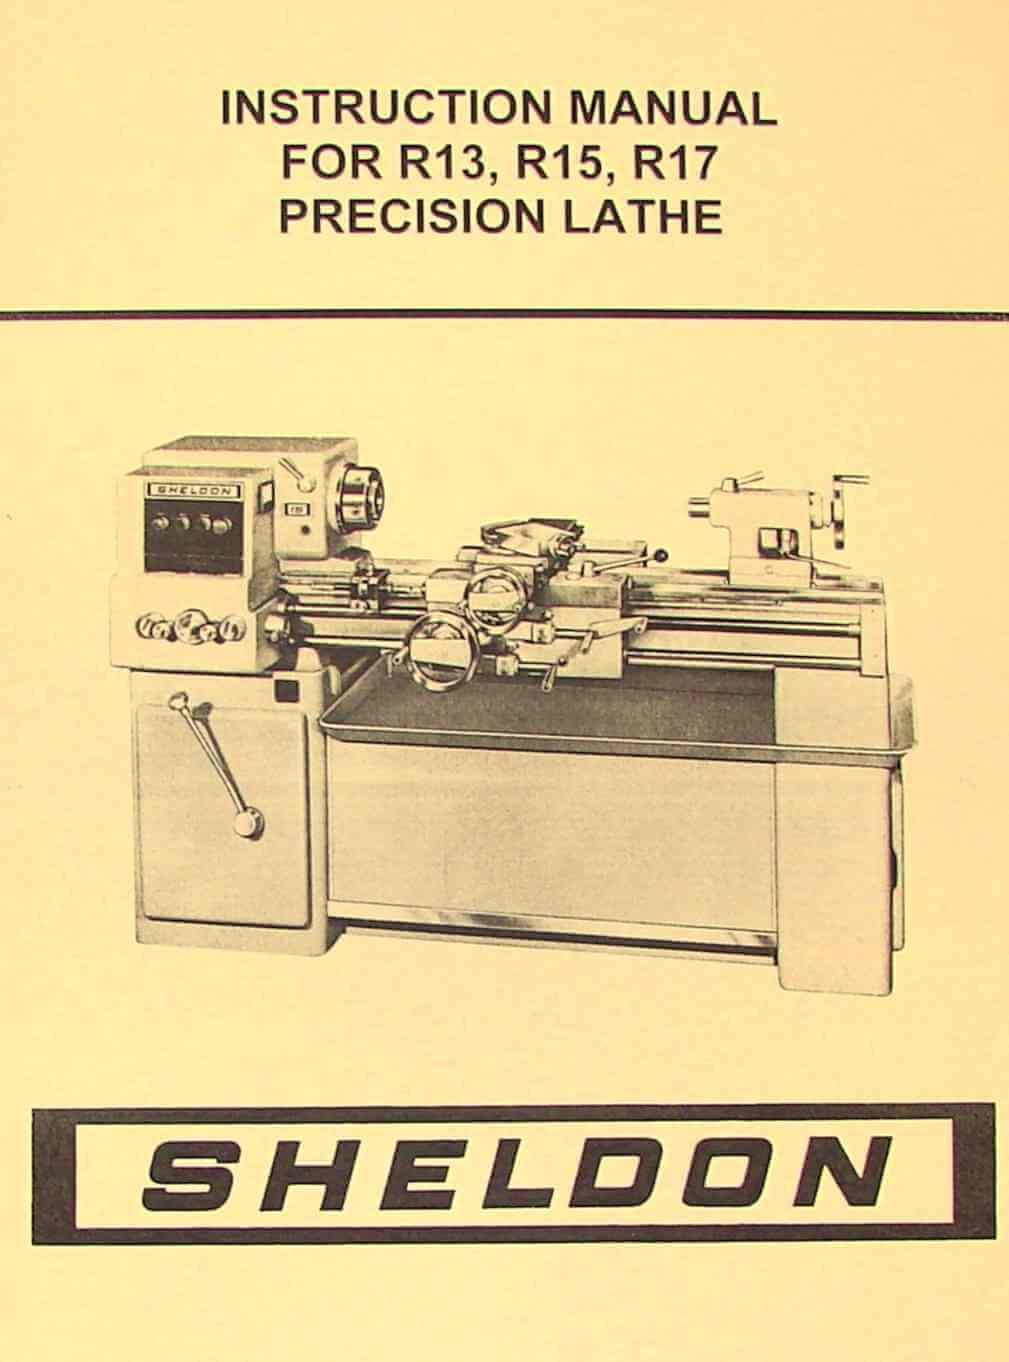 sheldon r13 r15 r17 precision metal lathe operator s manual ozark tool manuals books